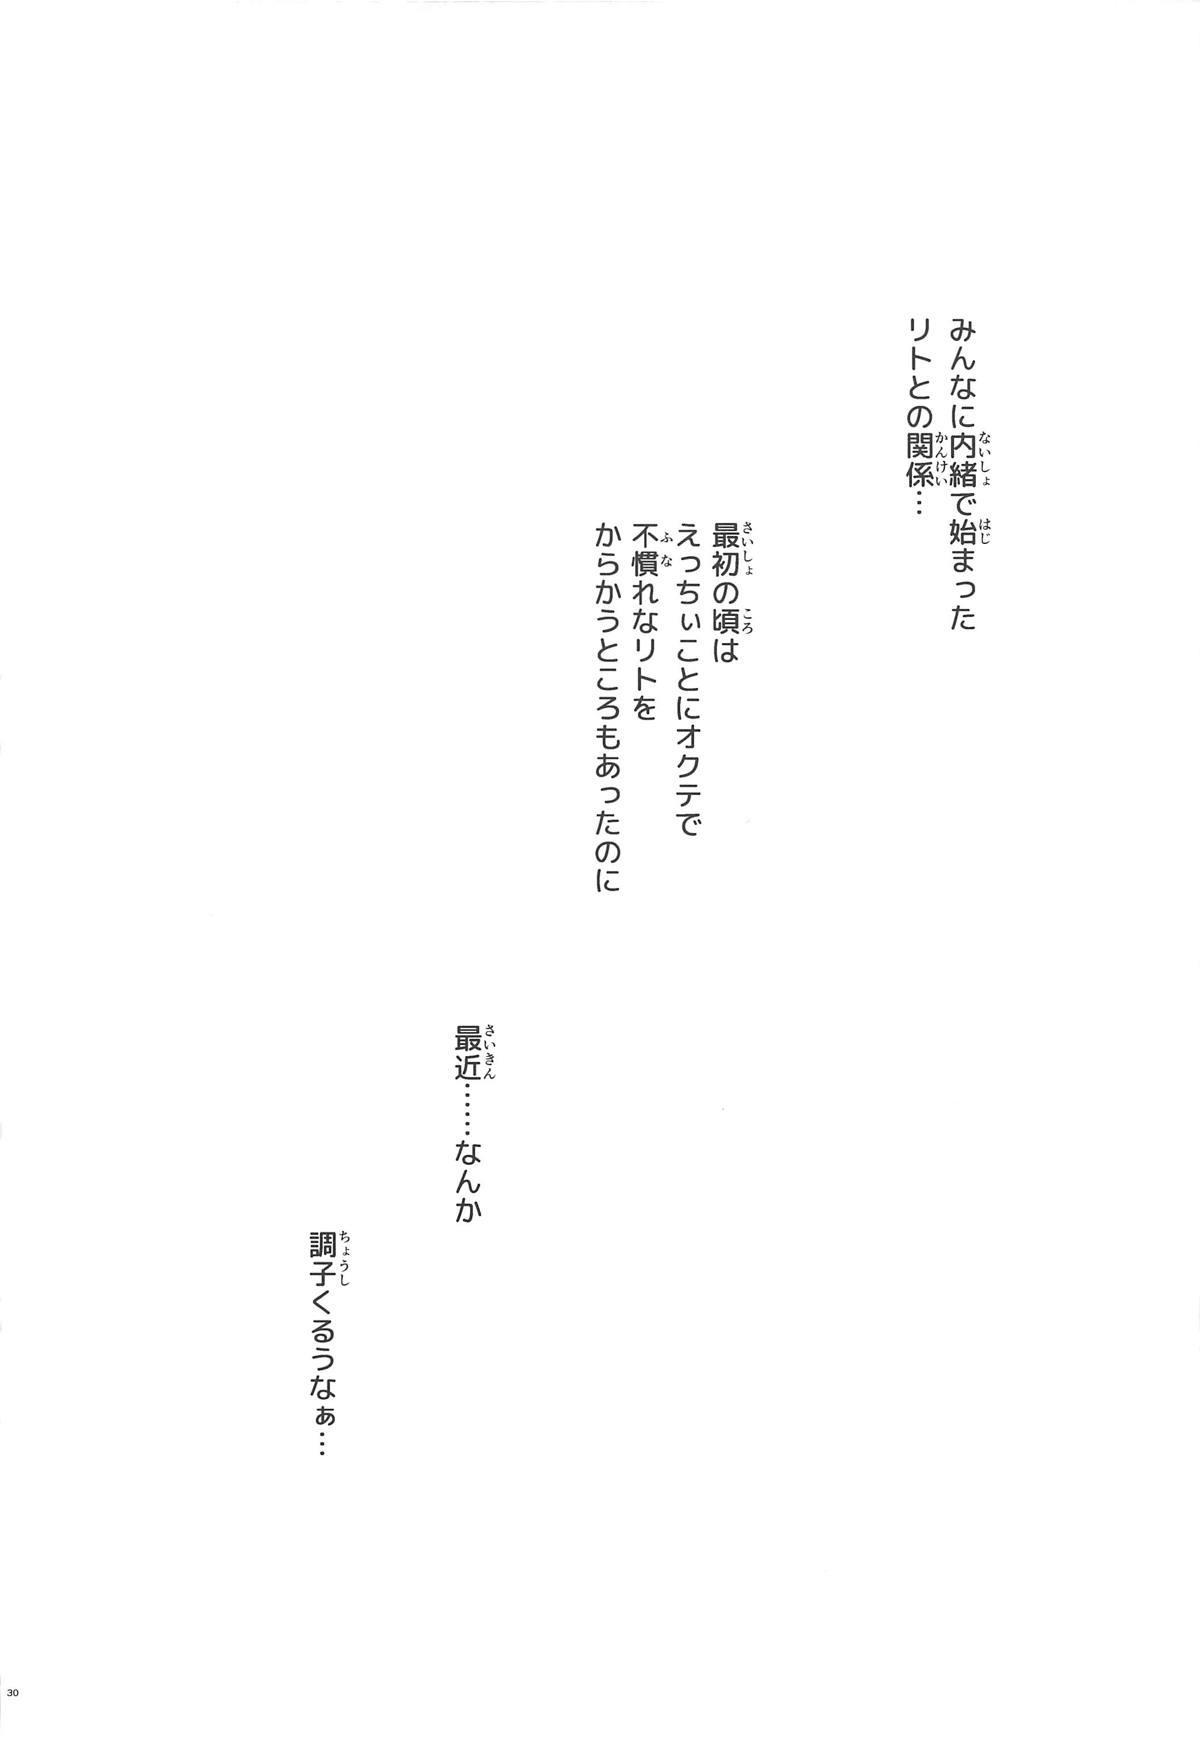 Mikan, Imouto, 16-sai. Soushuuhen 28